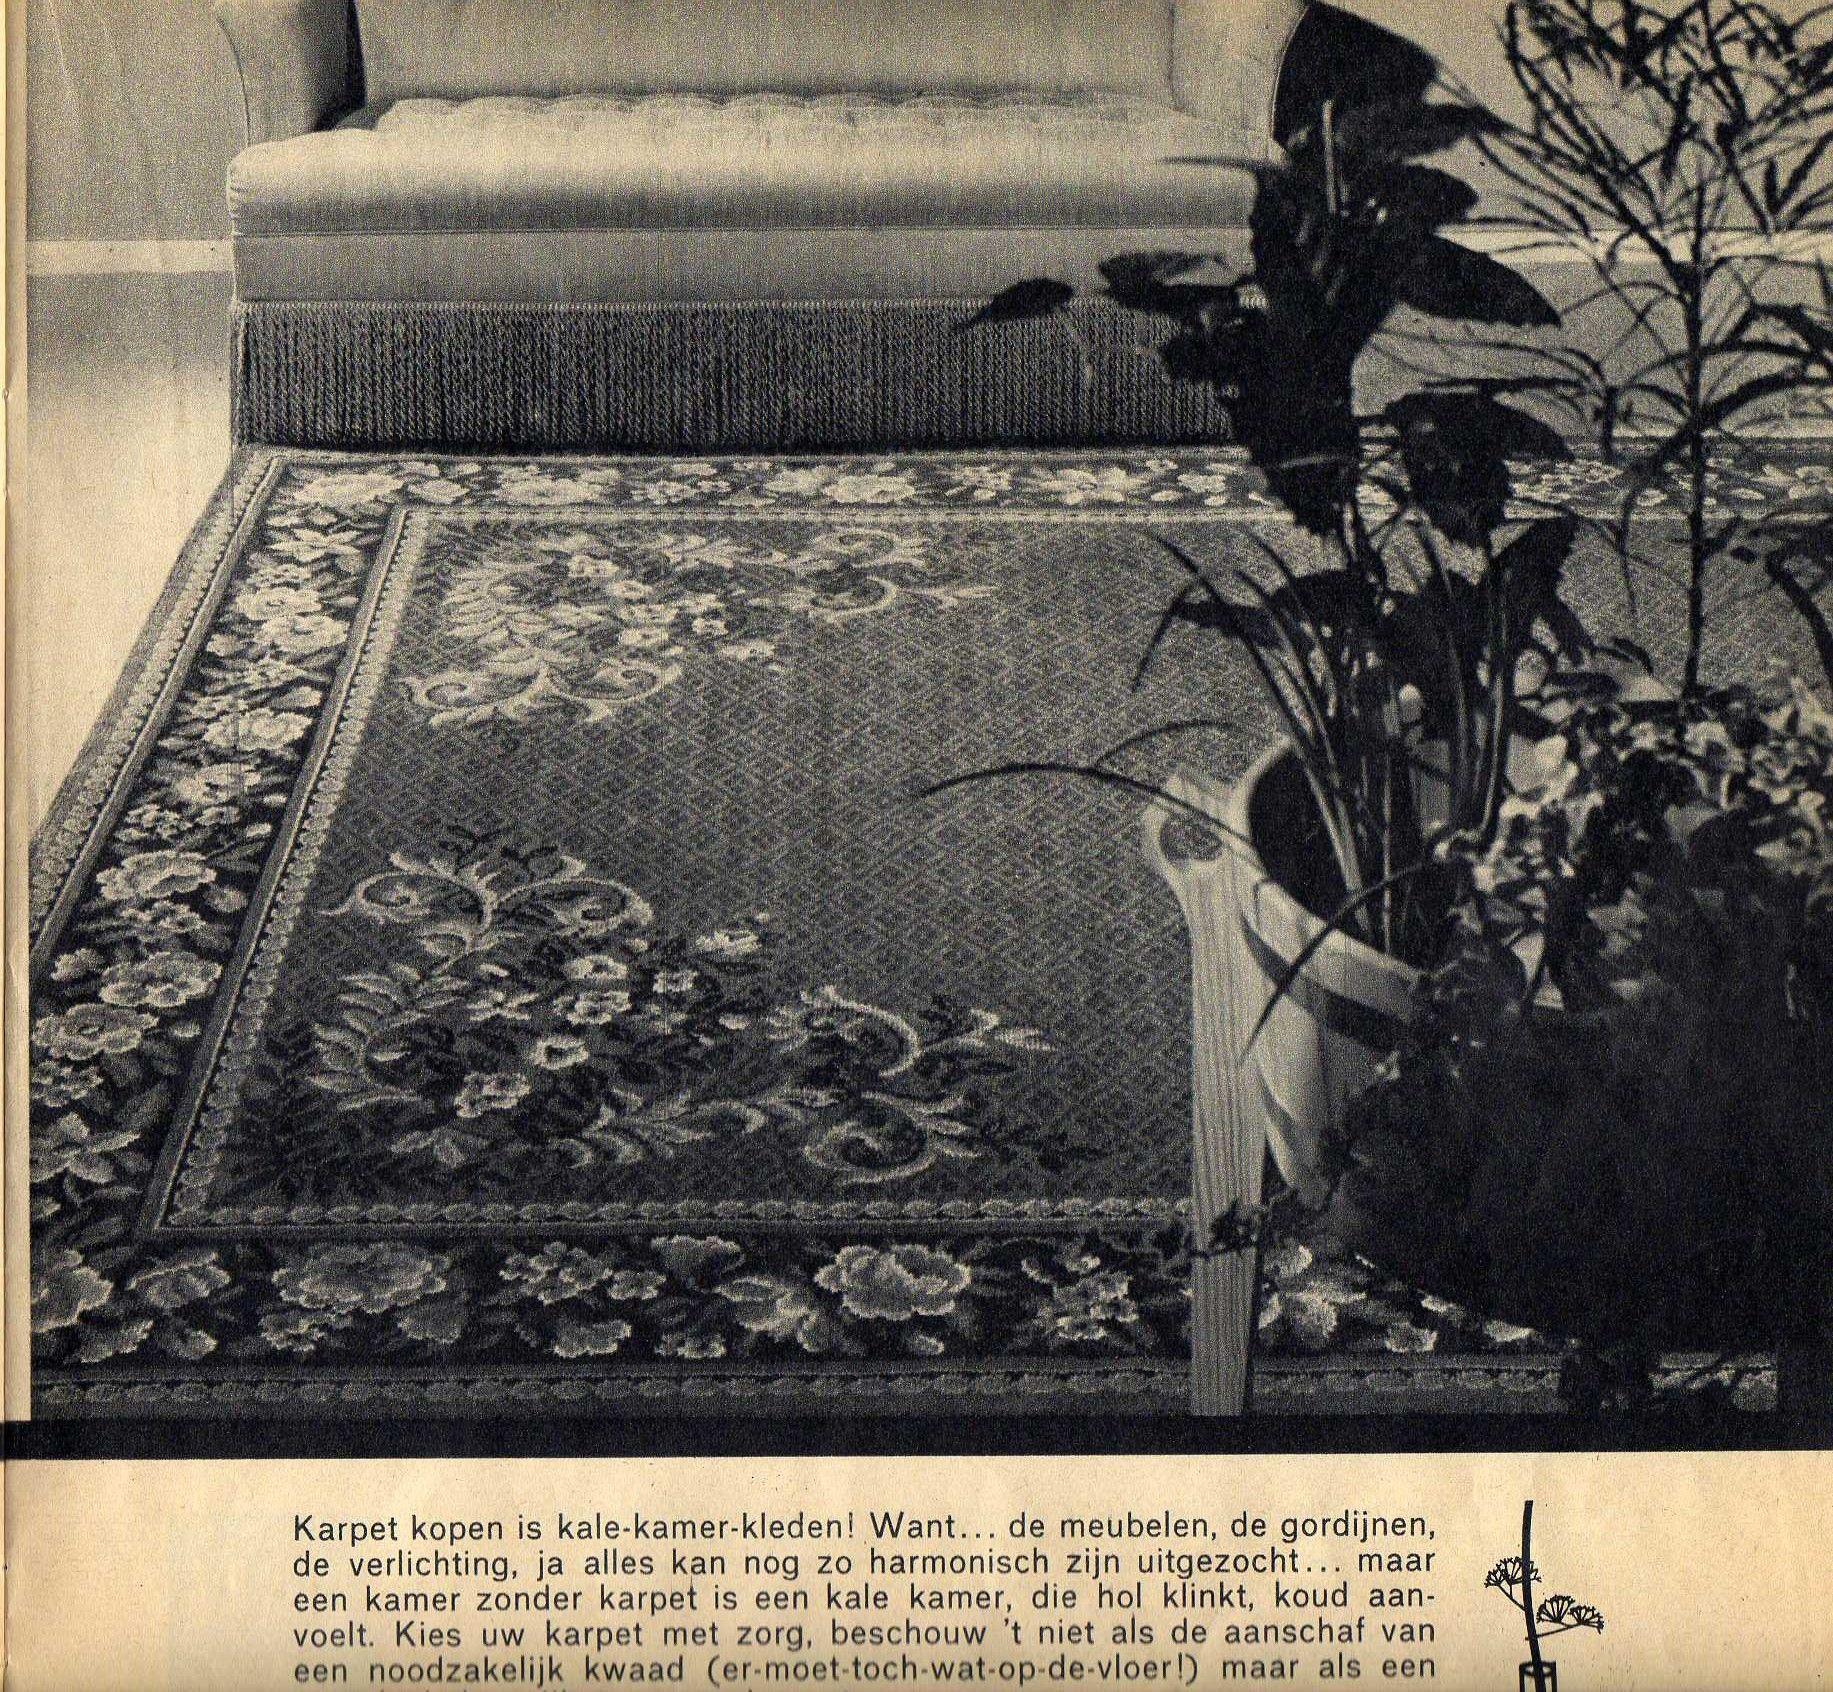 55 best 1960s interior & fashion images on Pinterest